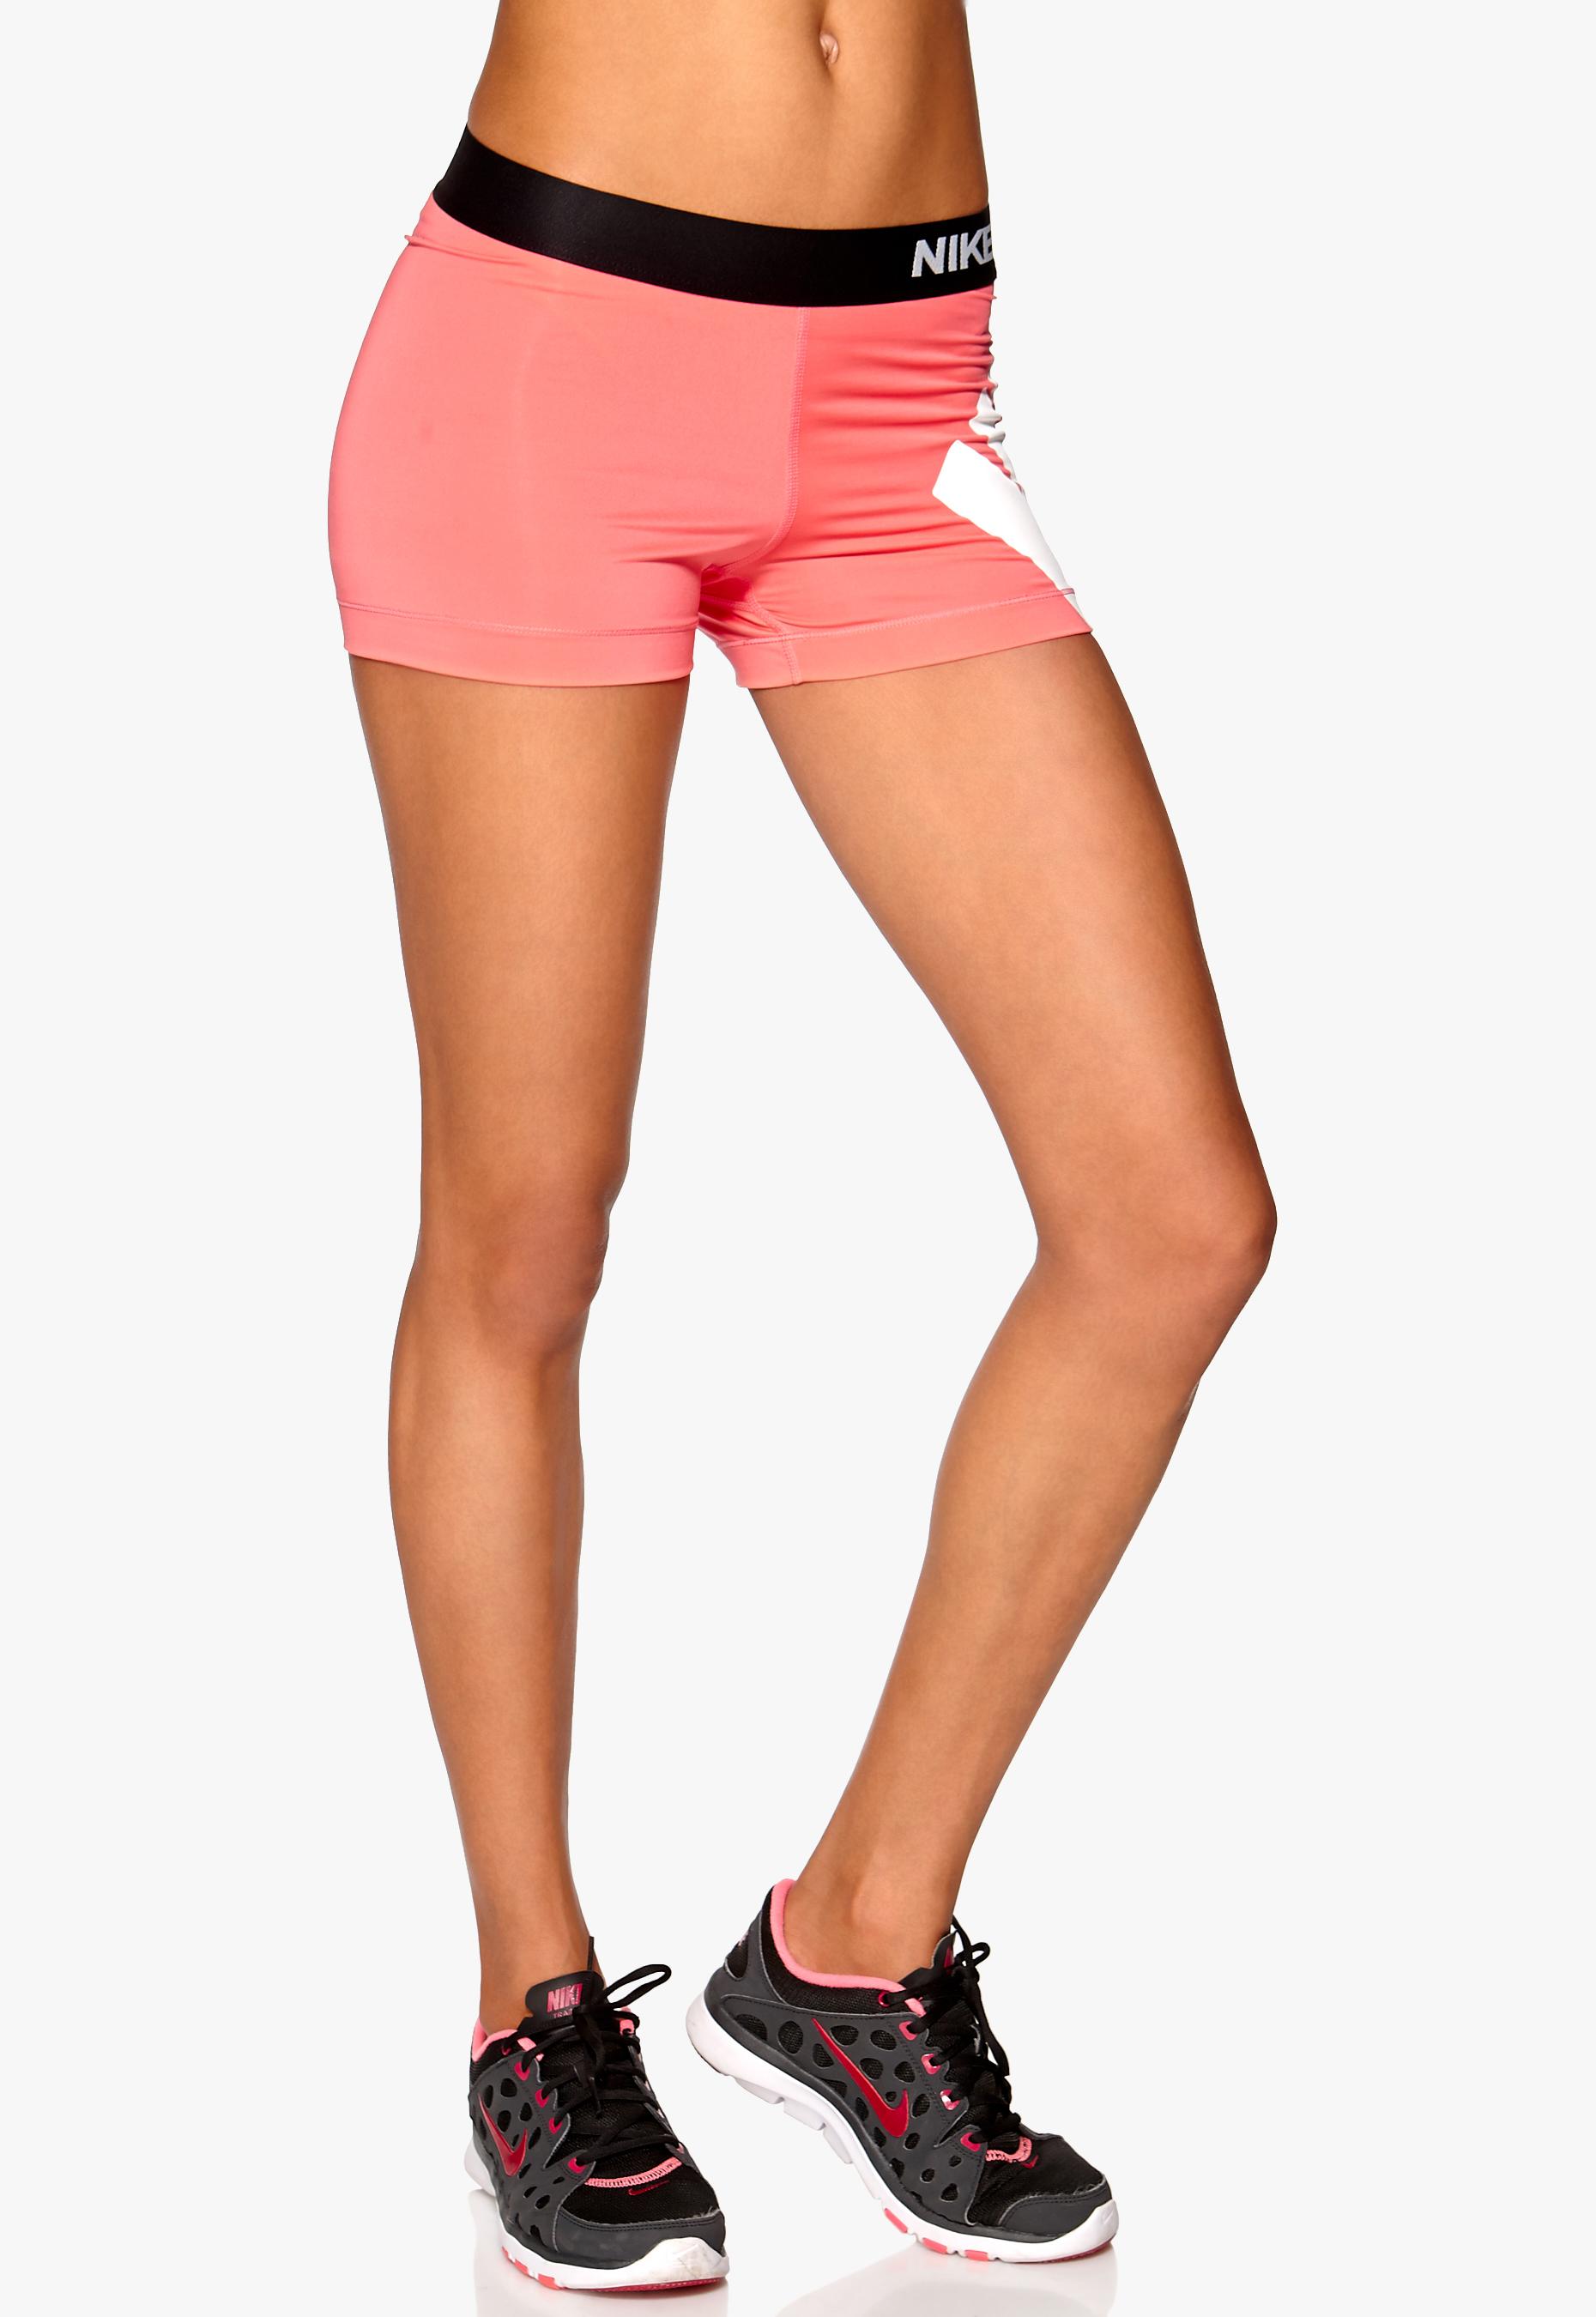 81433a8f Nike Pro Logo Shorts 654 Apricot - Bubbleroom